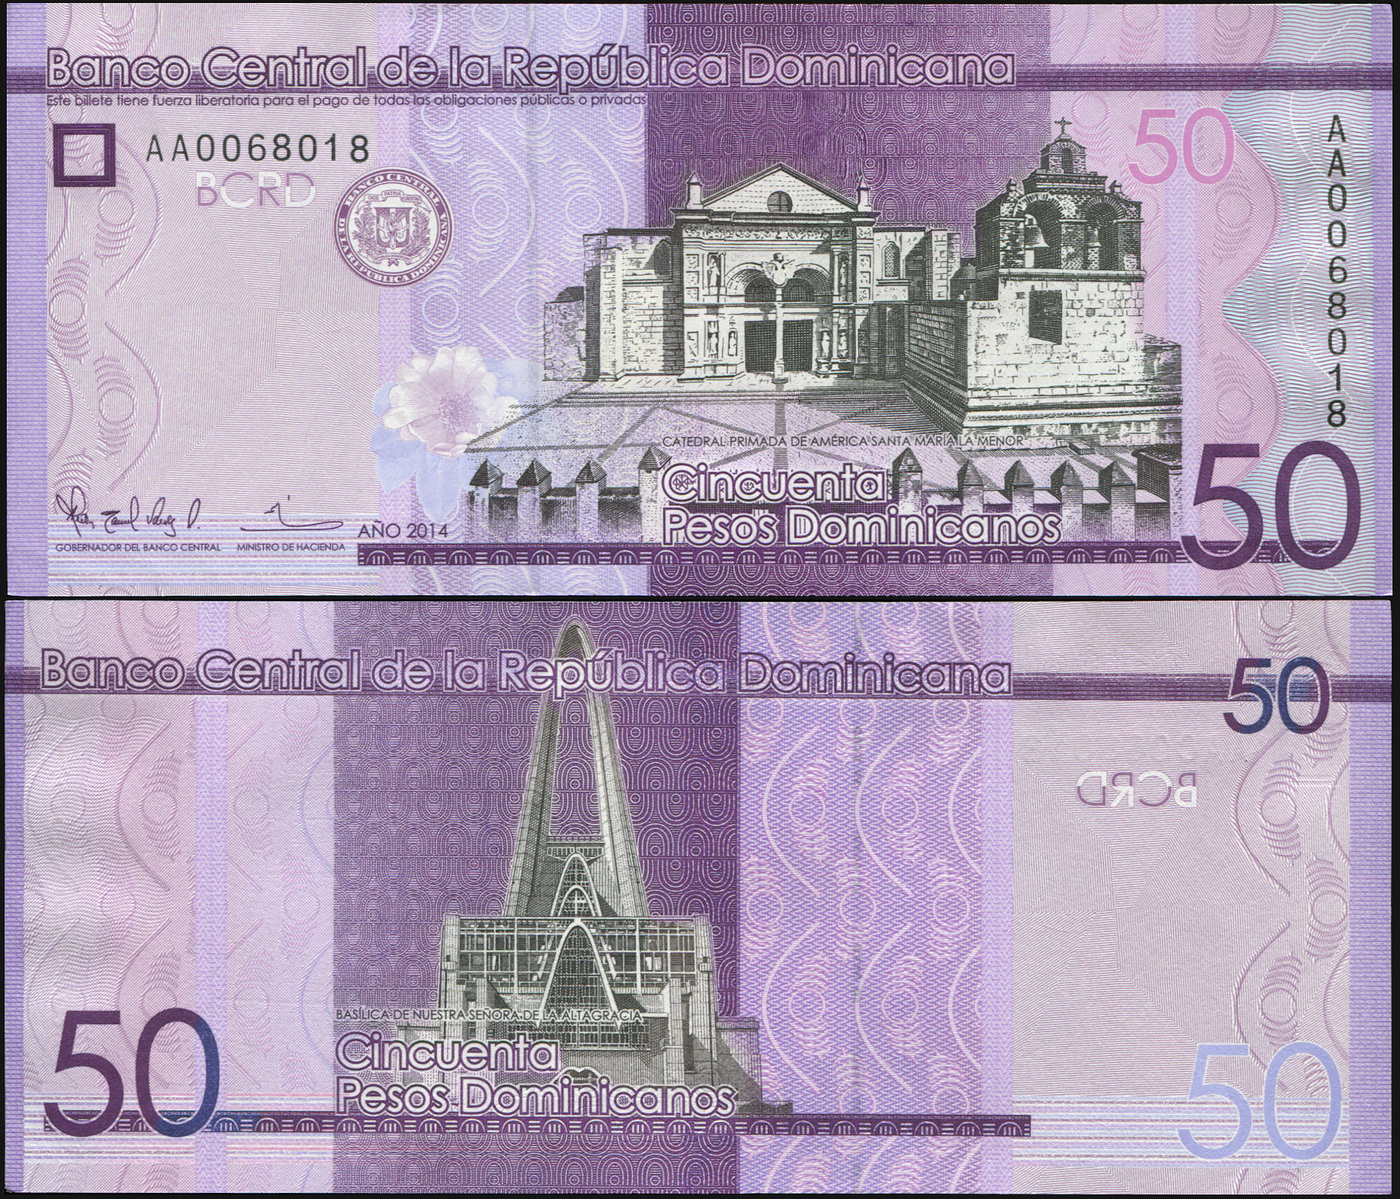 Банкнота. Доминиканская республика 50 песо доминикано. 2014 UNC. Кат.P.189a